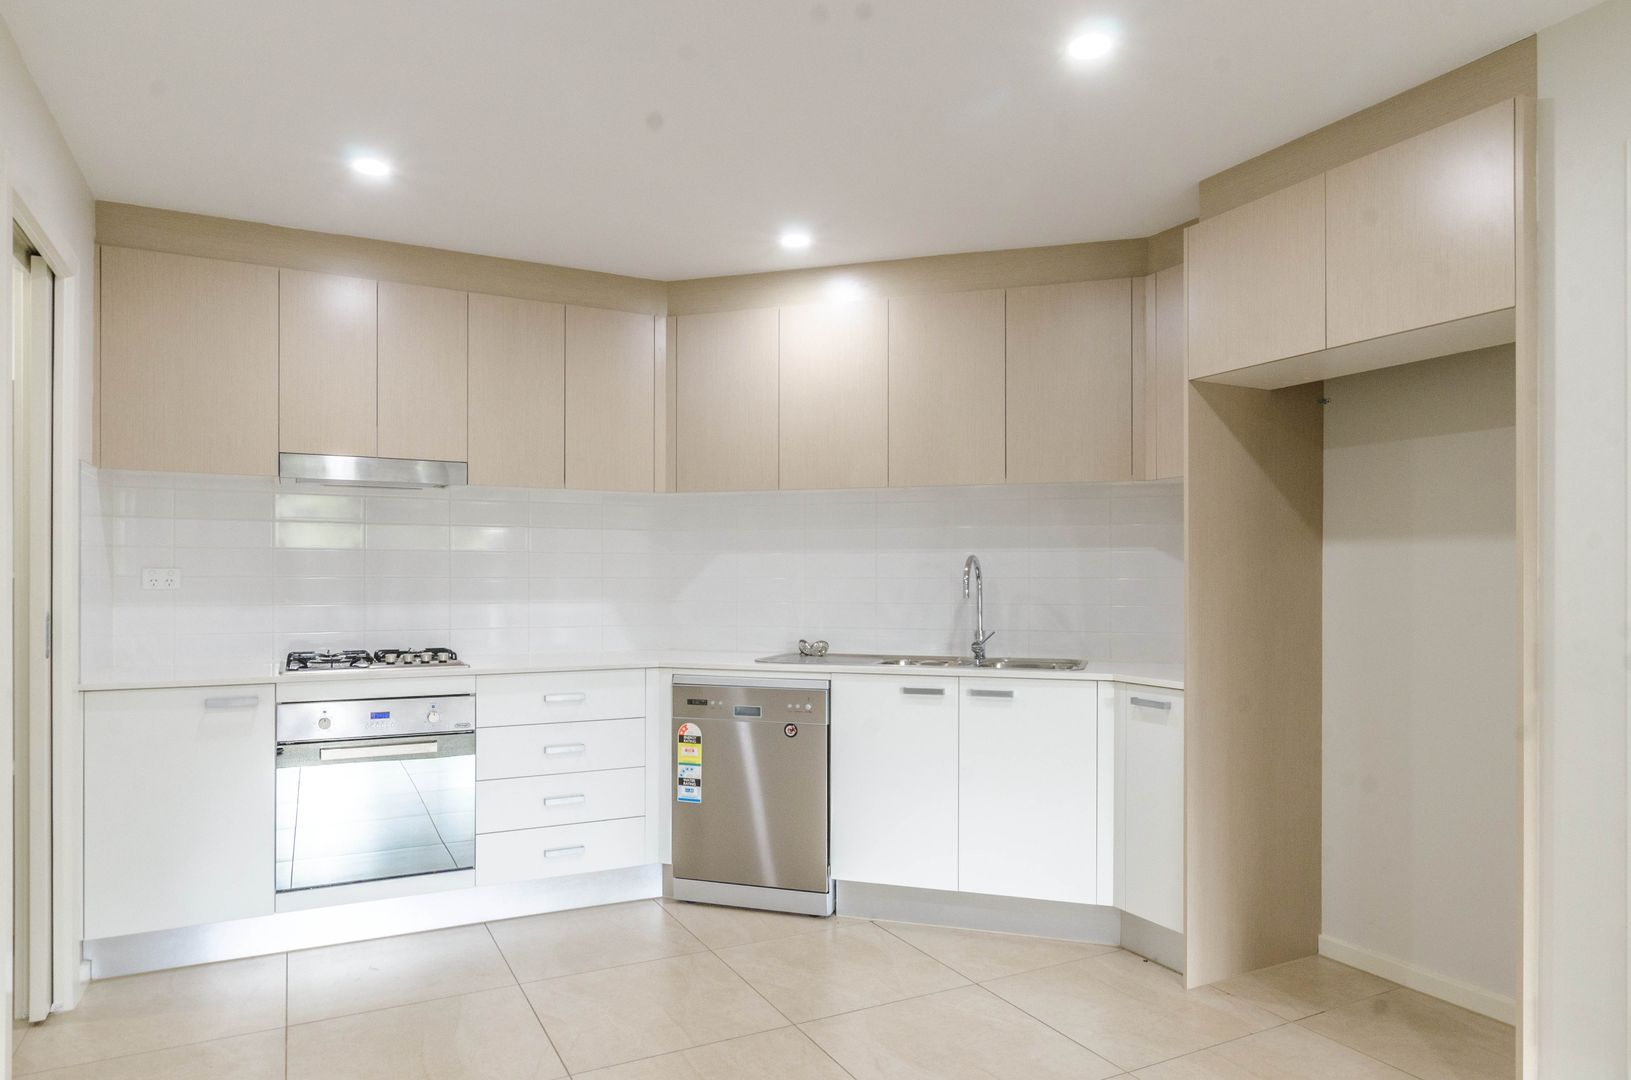 3/38 Chamberlain Street, Campbelltown NSW 2560, Image 2